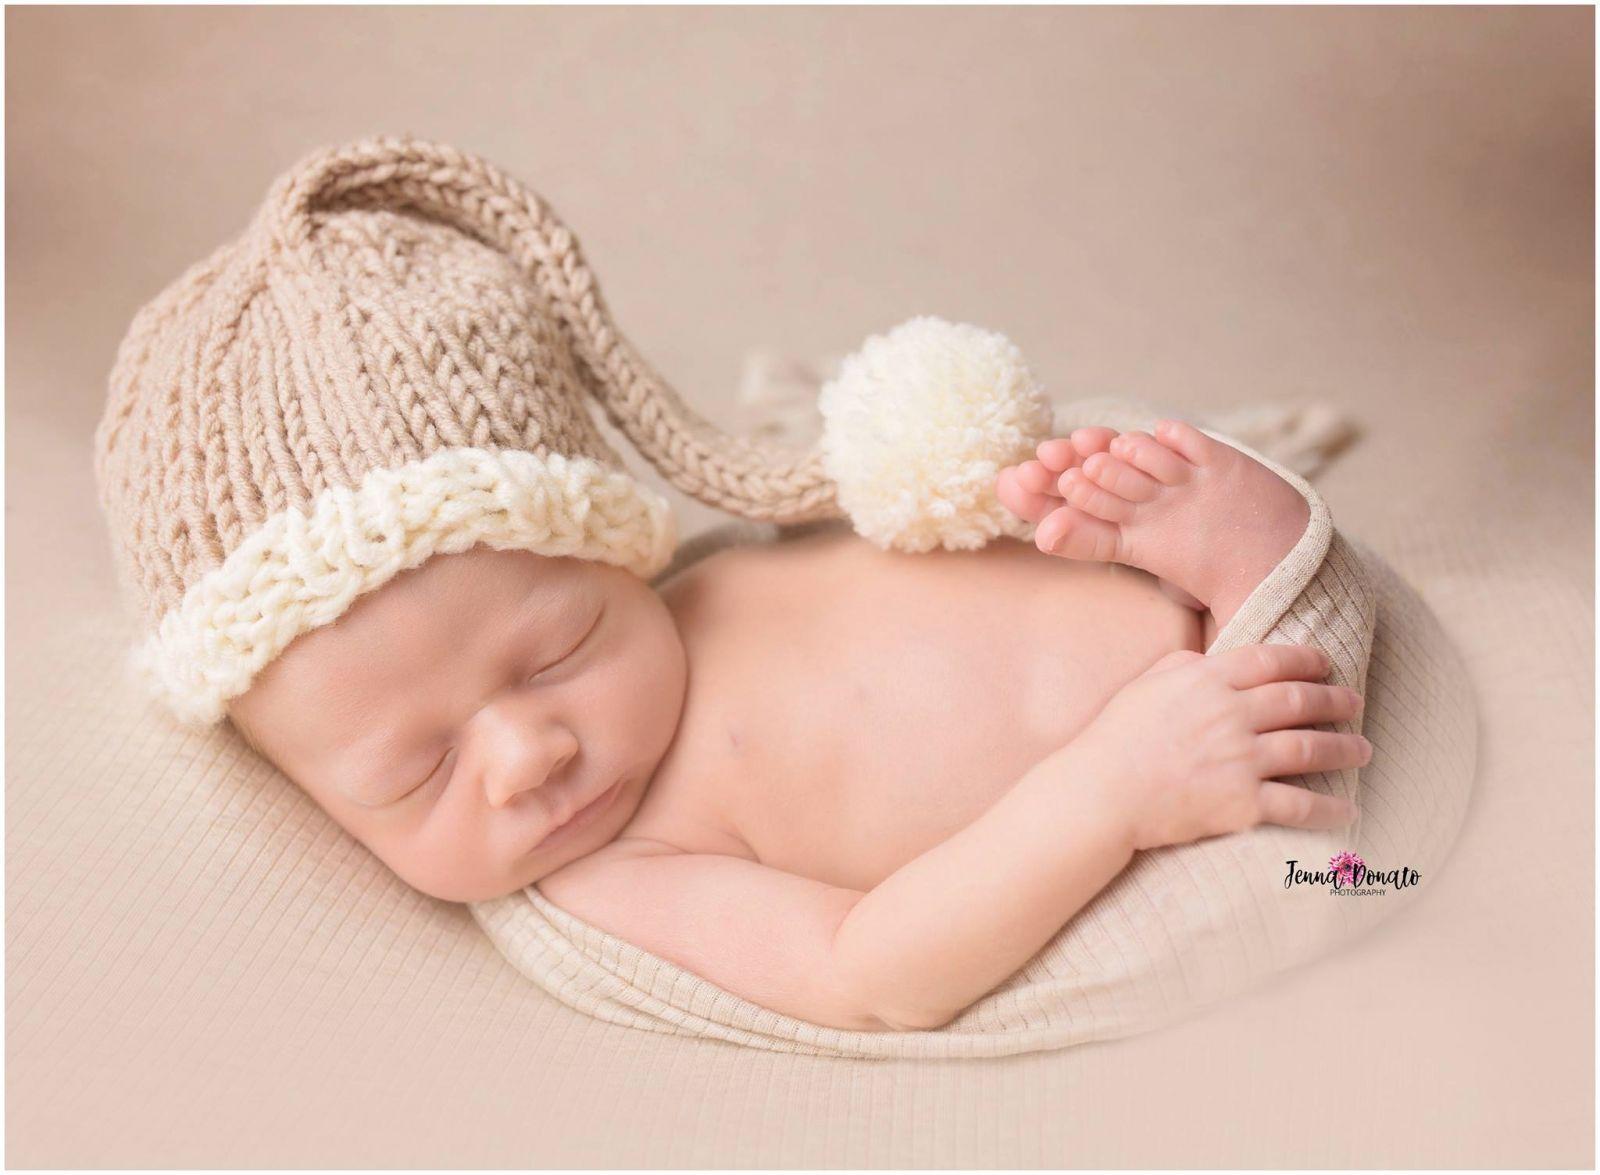 Newborn Hat Pattern For The Holidays Free Knitting Patterns